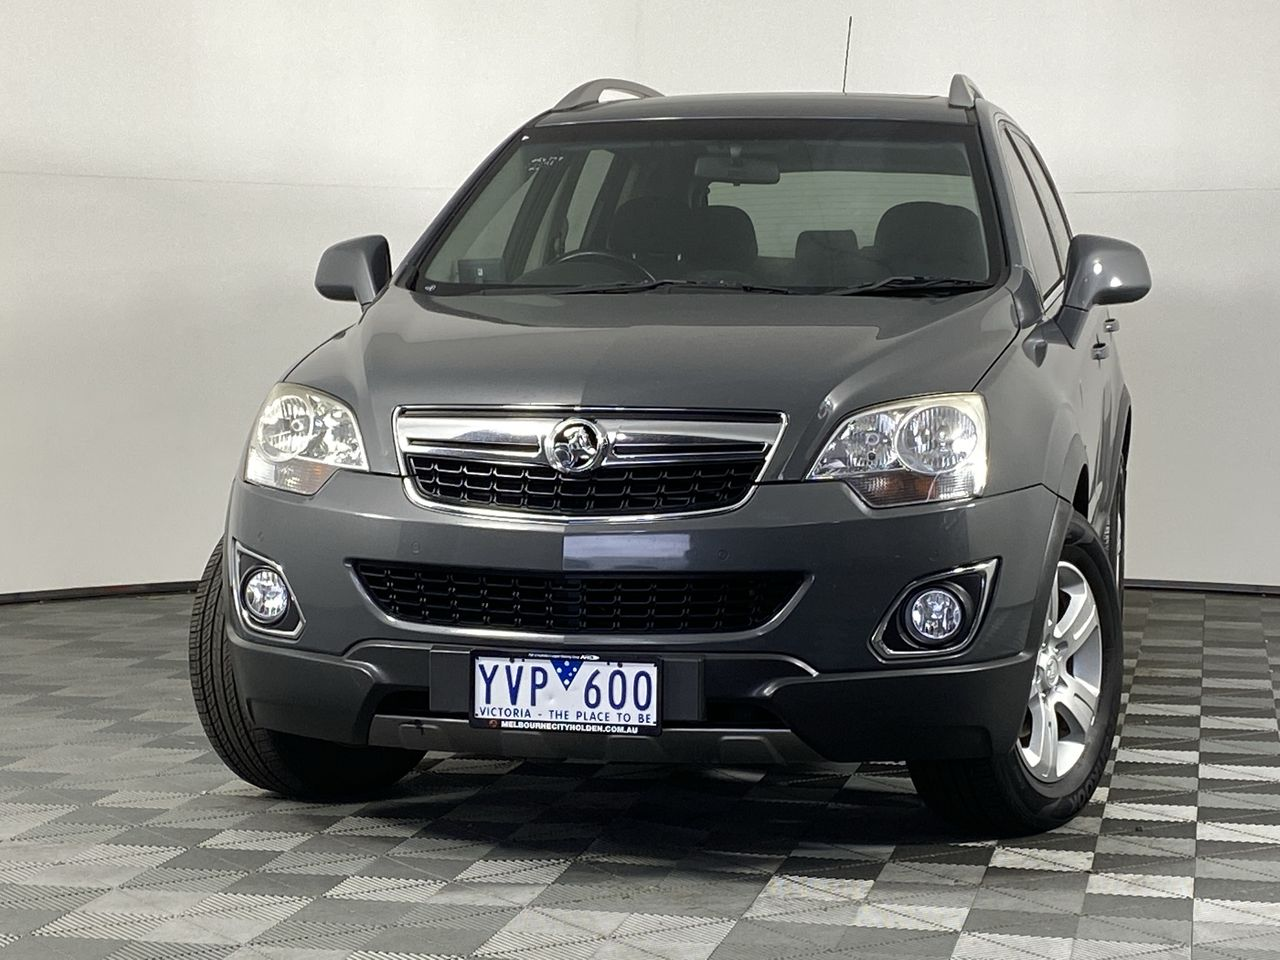 2011 Holden Captiva 5 (4x4) CG II Turbo Diesel Automatic Wagon